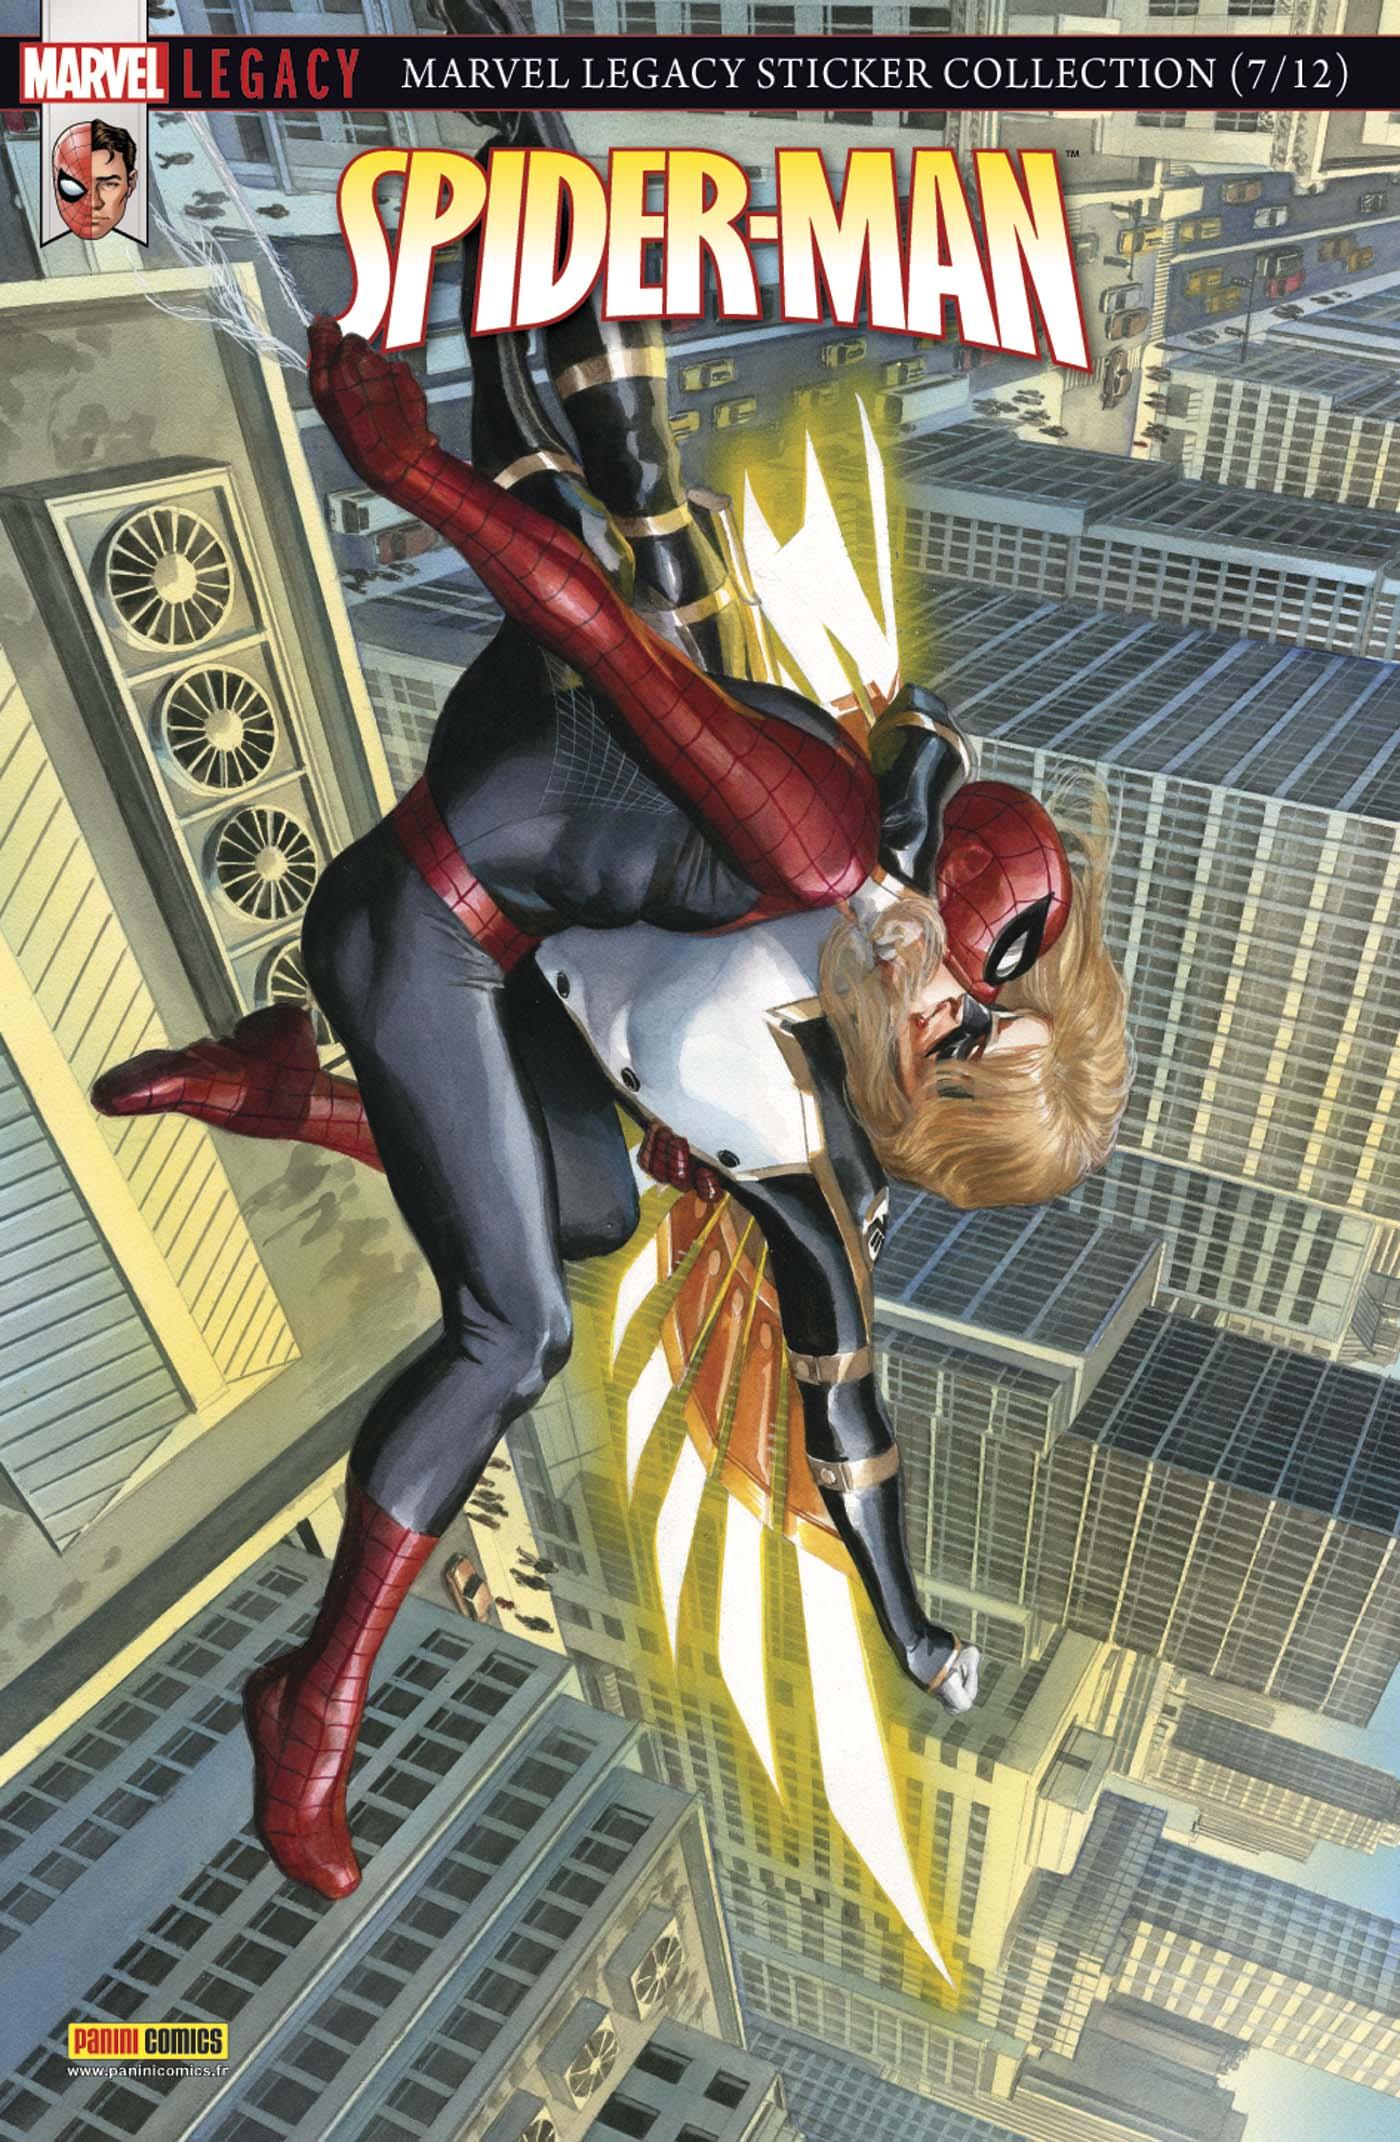 Marvel Legacy Spider-Man n°2 (VF)